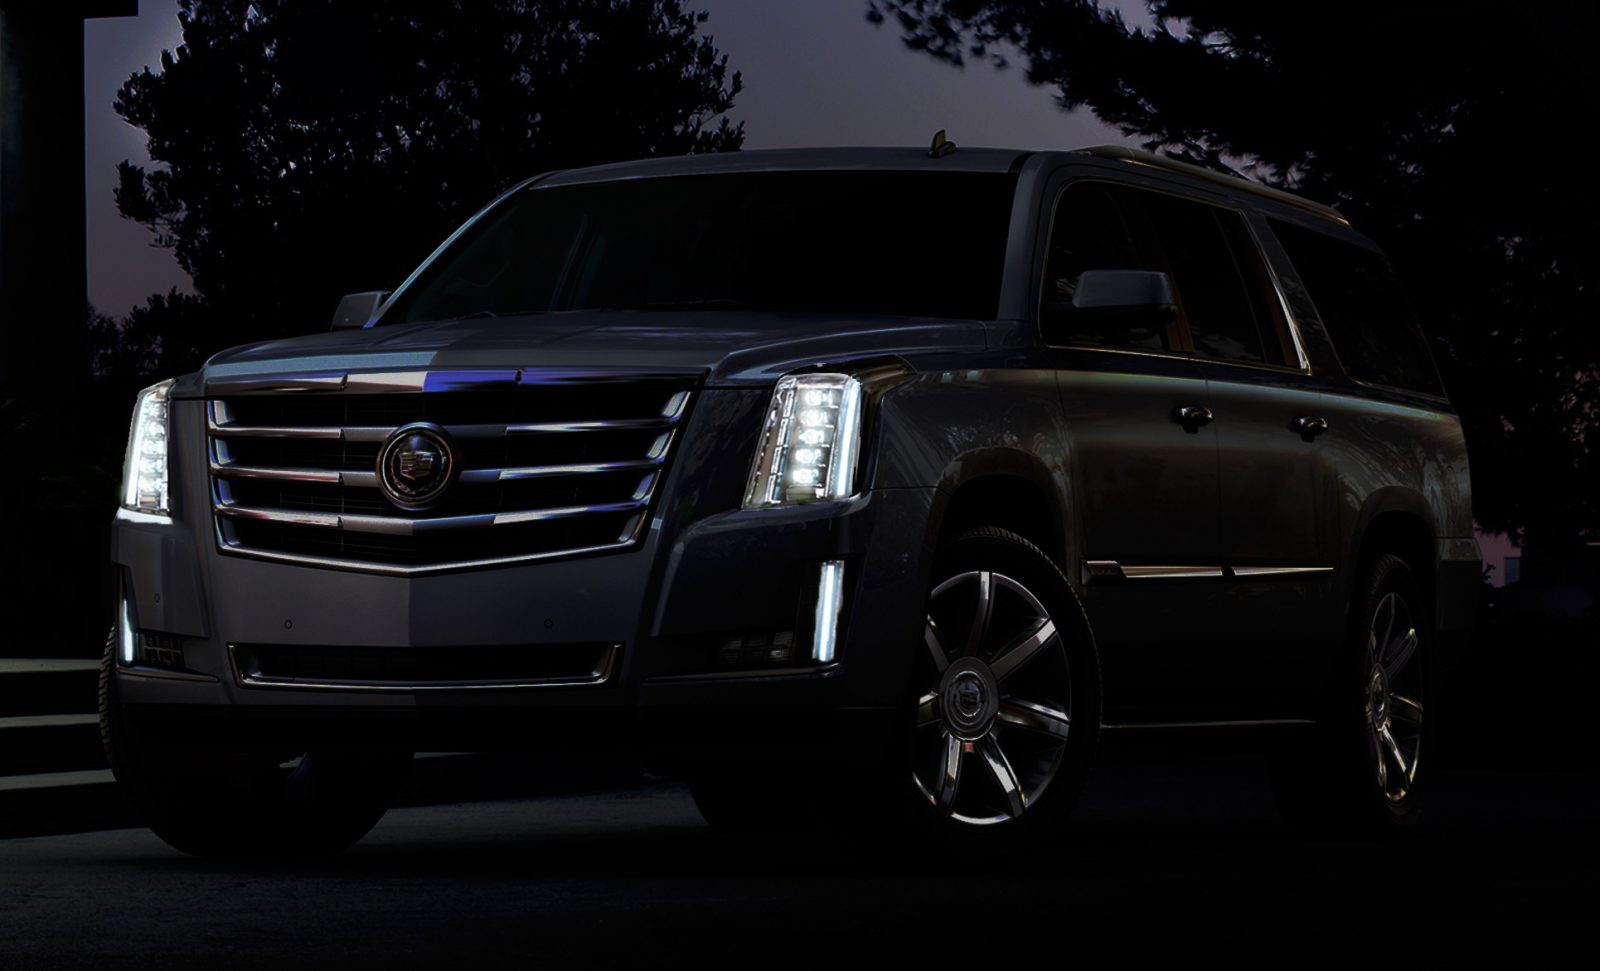 2015 Cadillac Escalade In-Depth Review + Mega Galleries30